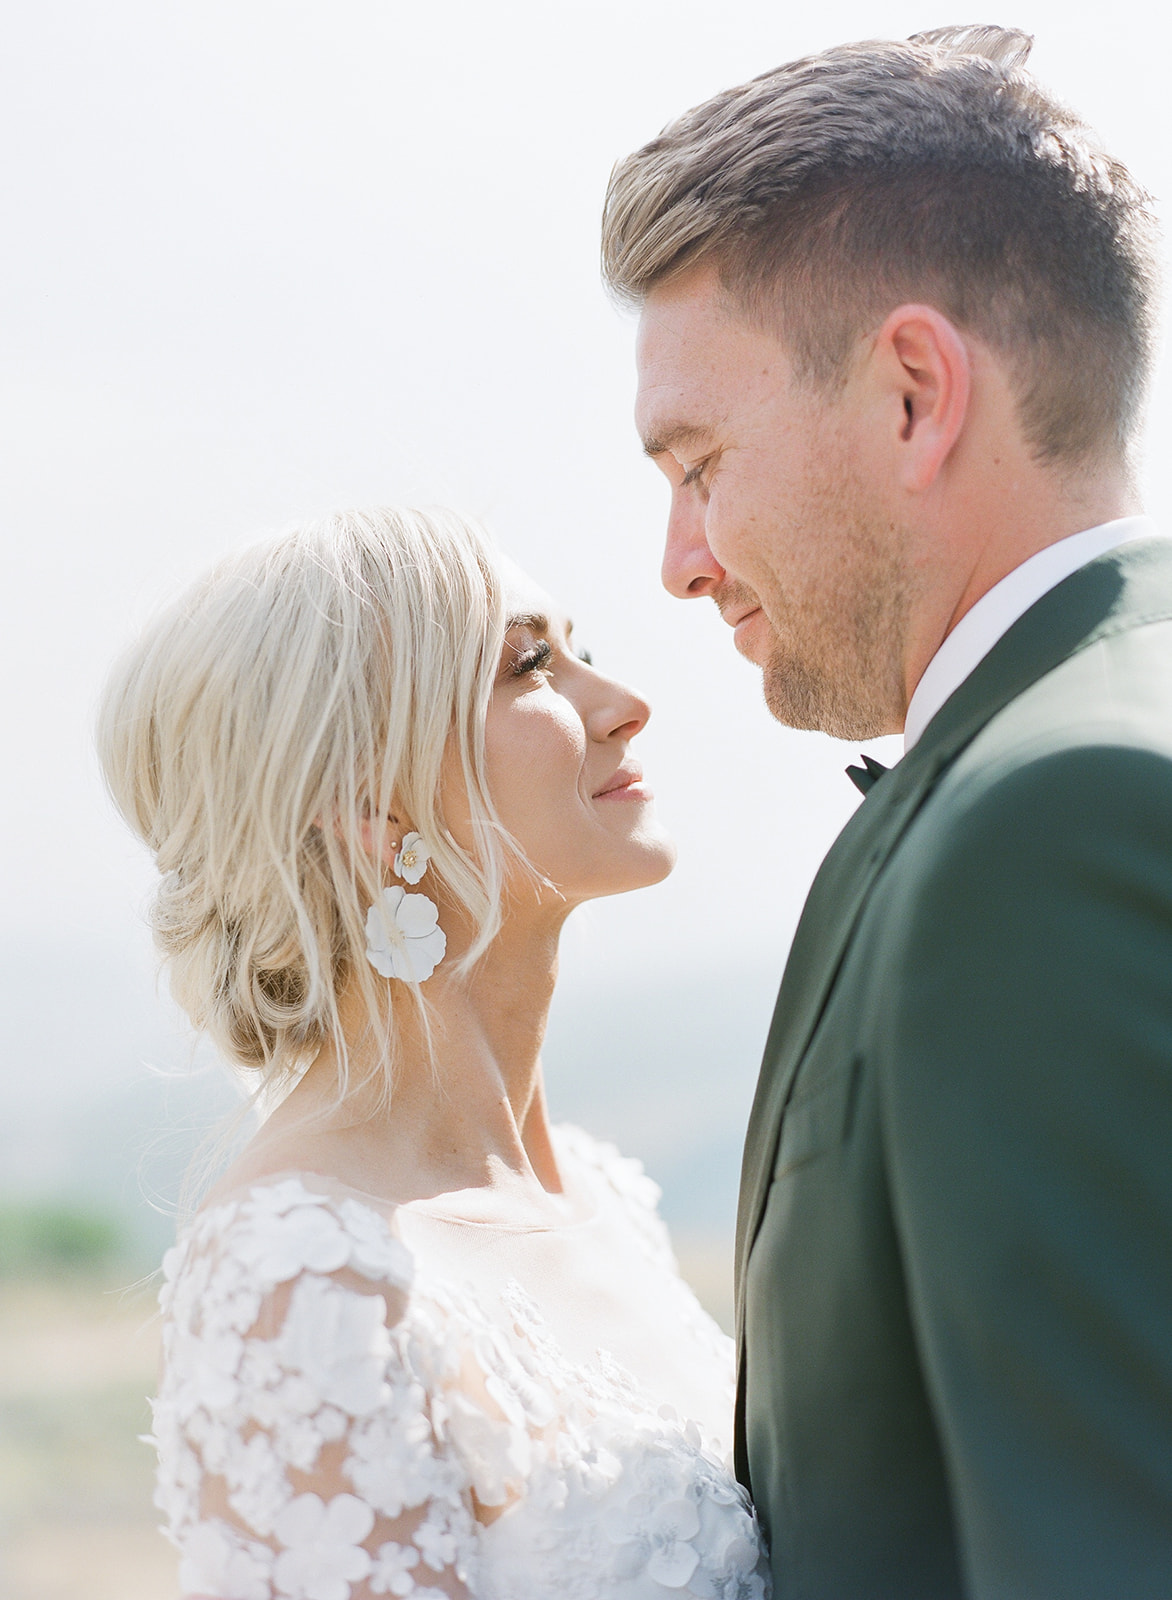 Ashlee Jensen at Summer Wedding Looking at Dane, Her Groom